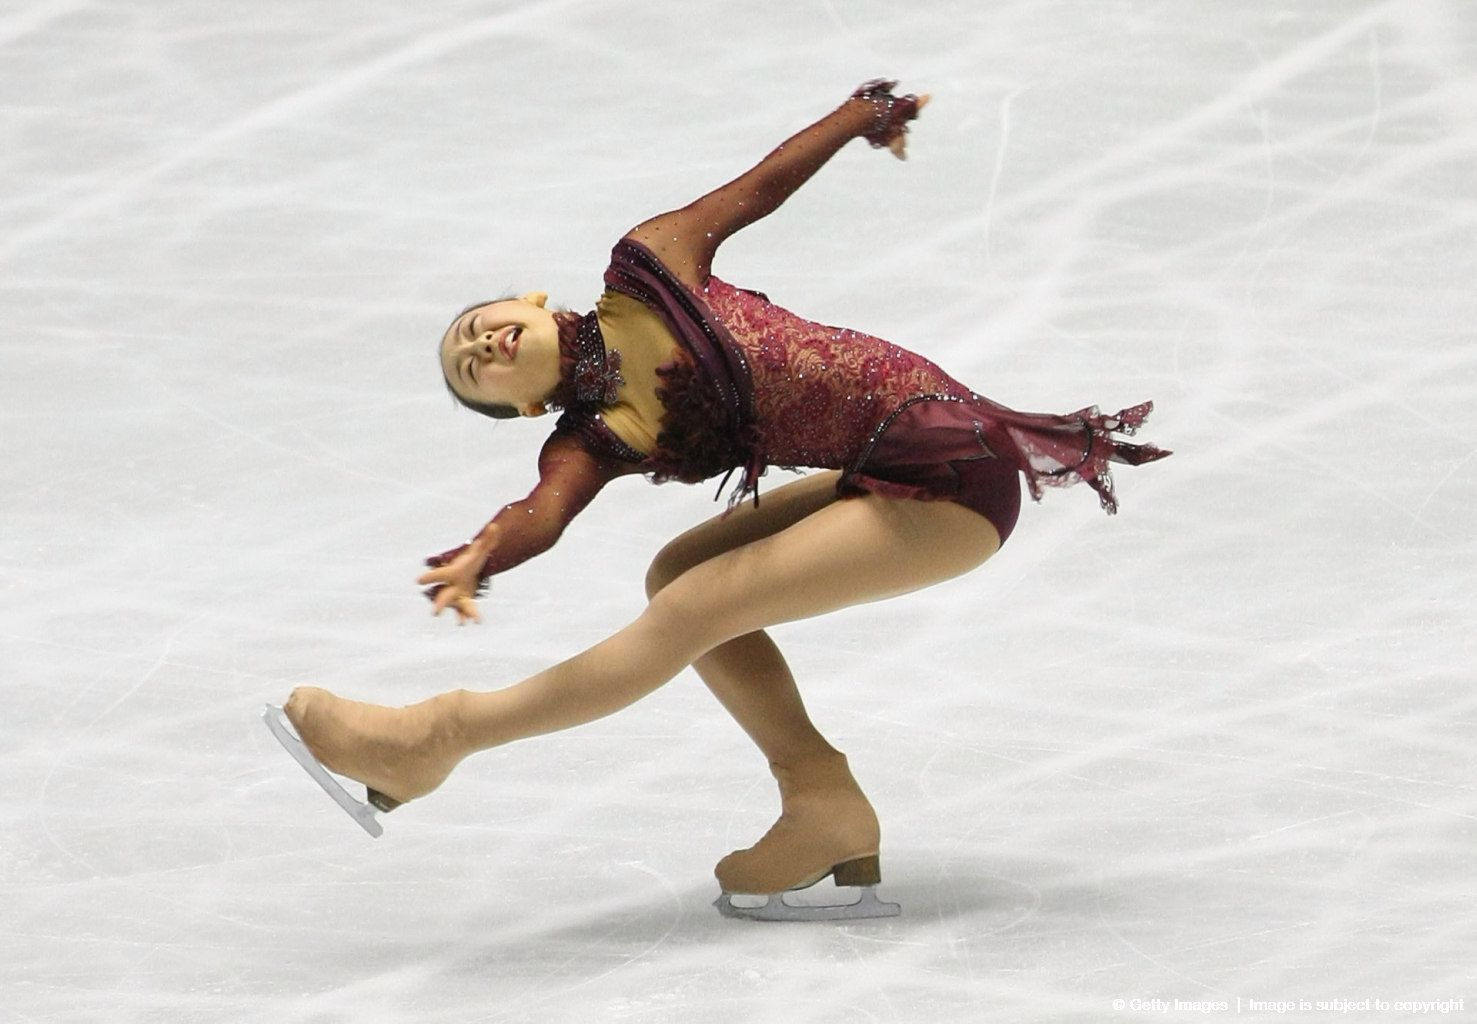 ISU World Team Trophy 2009 Getty Images (1477×1024)